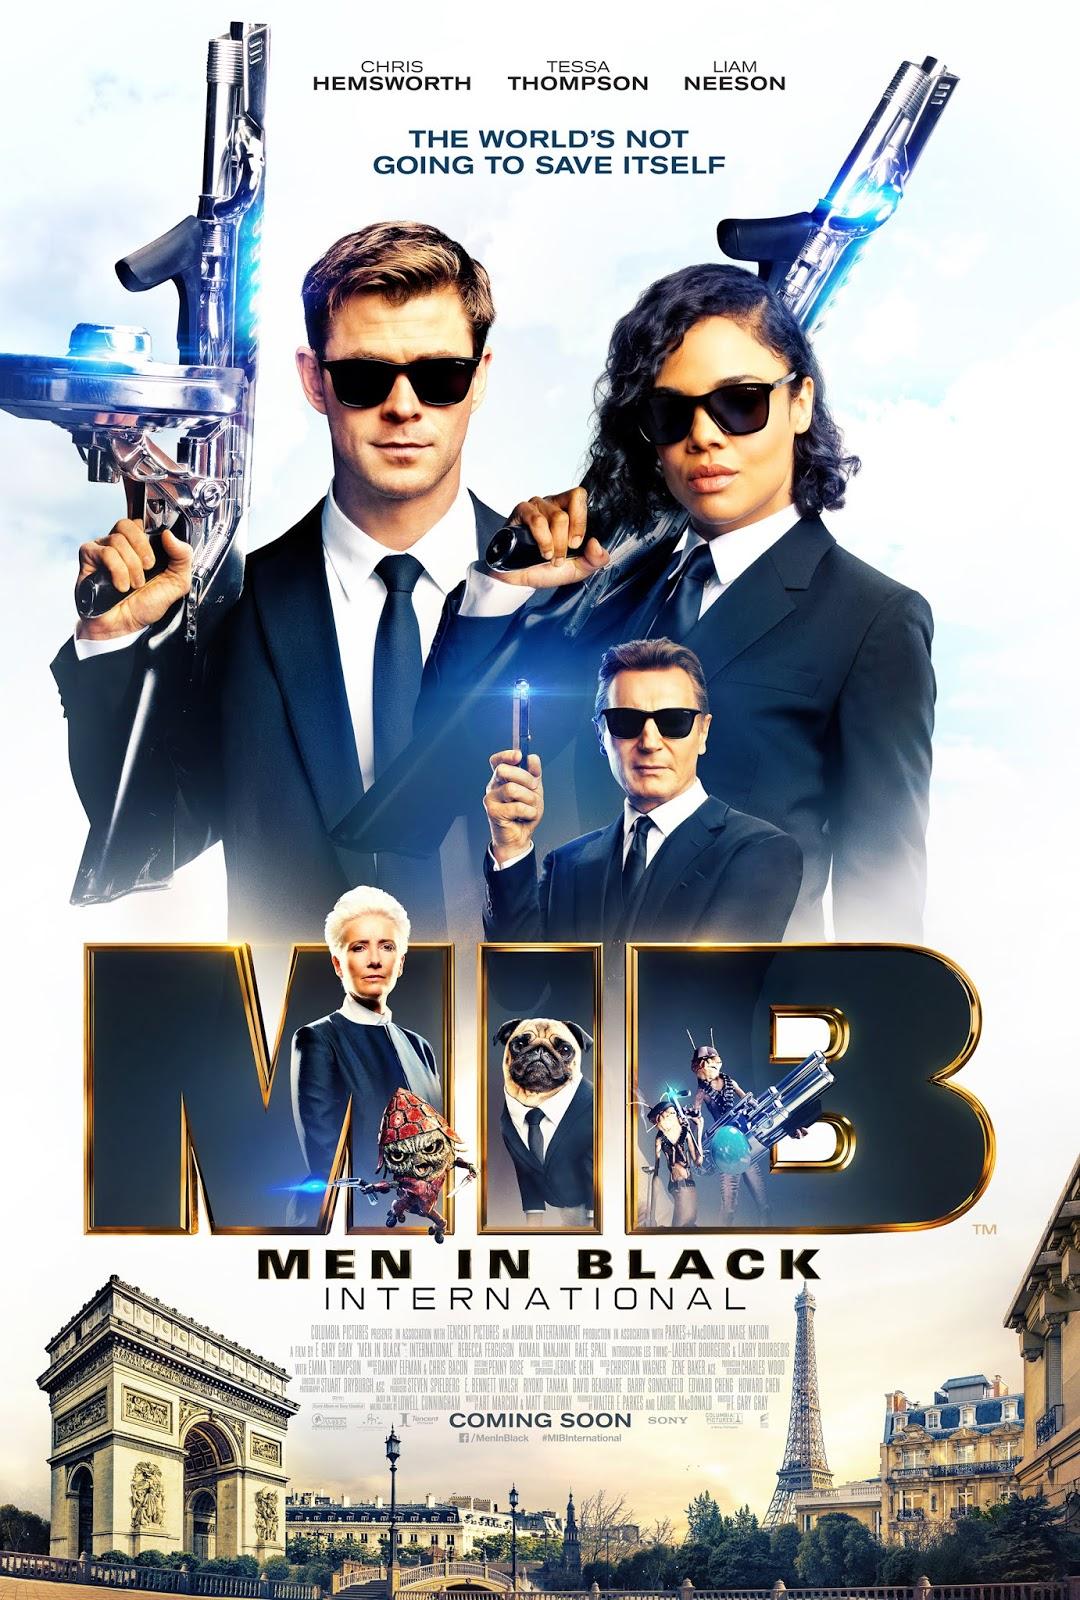 Men in Black International 2019 Dual Audio 720p HDCAM 800Mb